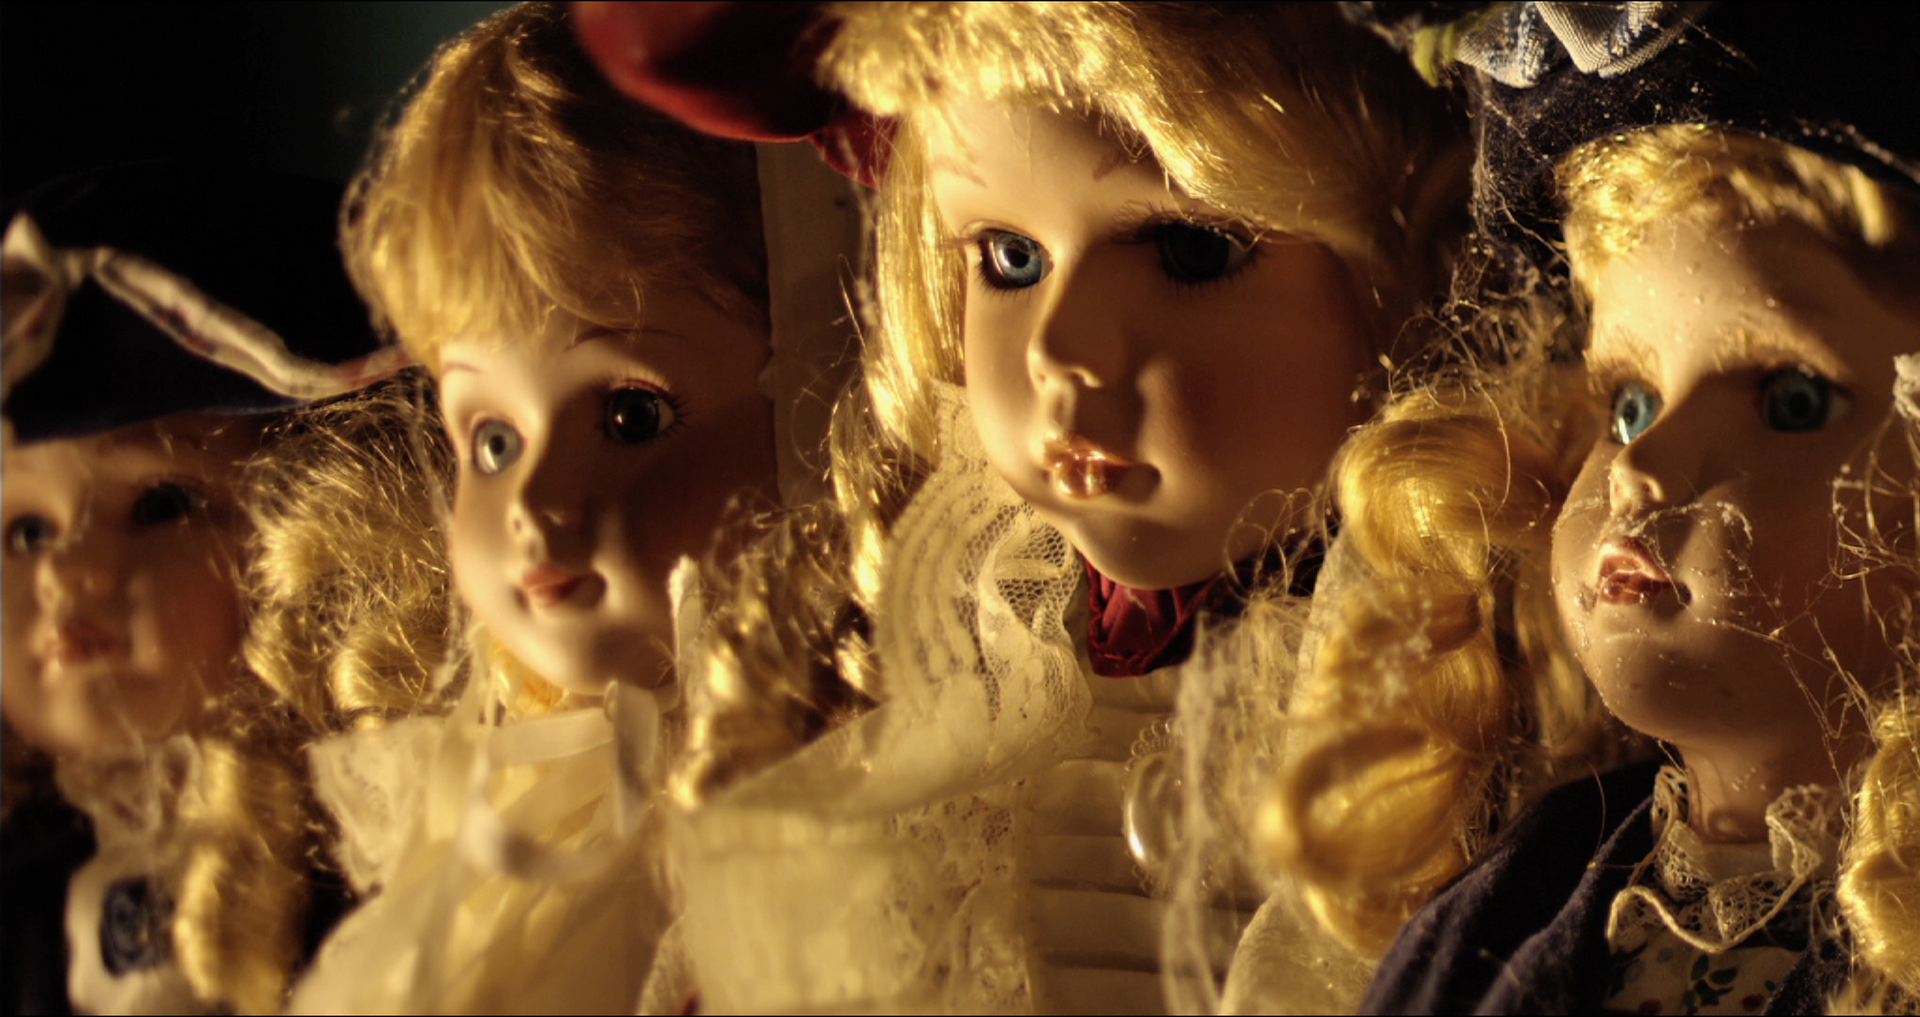 Dolls (2013) | UK | 4 mins | Colour | 5.1 | RED | Cooke S4s & Century Swing Swift